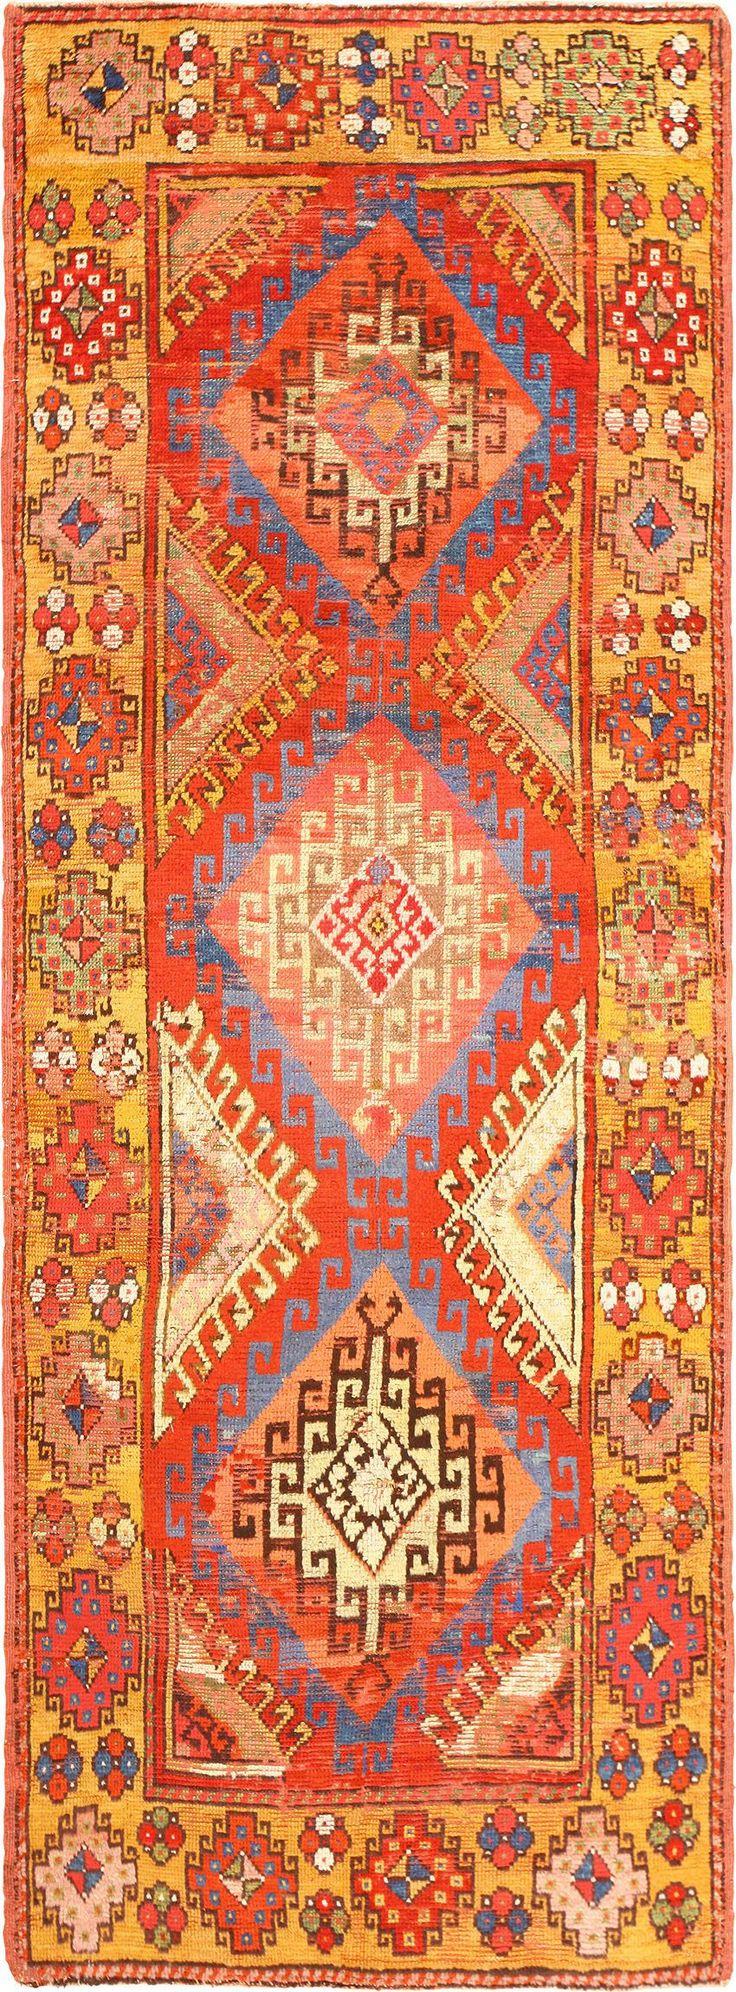 Antique Turkish Konya Rug 49100